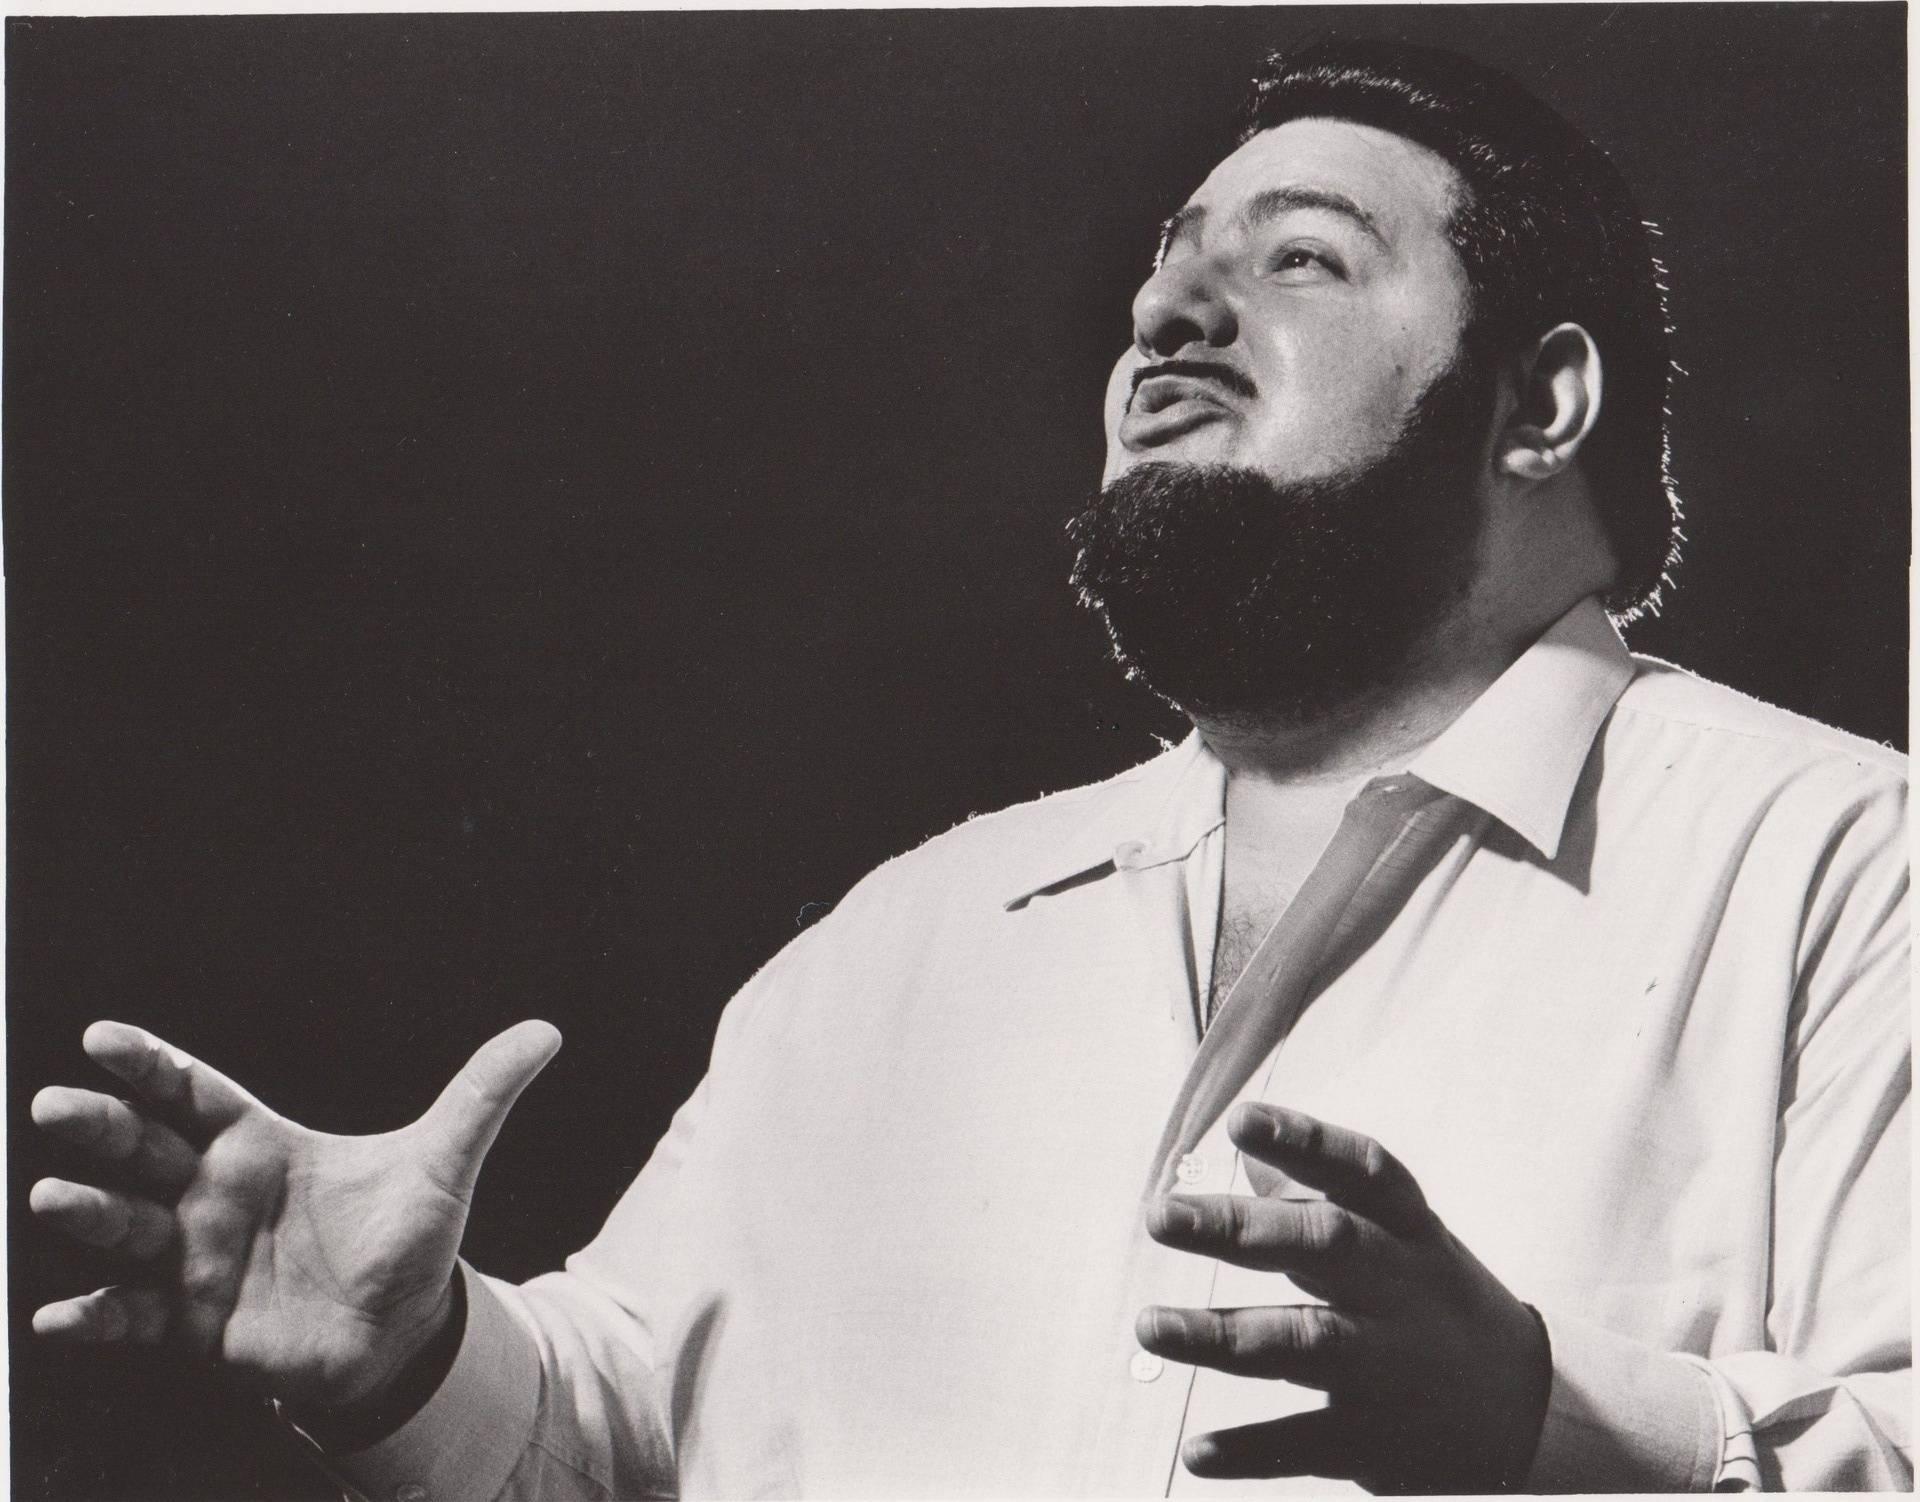 Cristoforo Padula America's Tenor from Opera to Popra